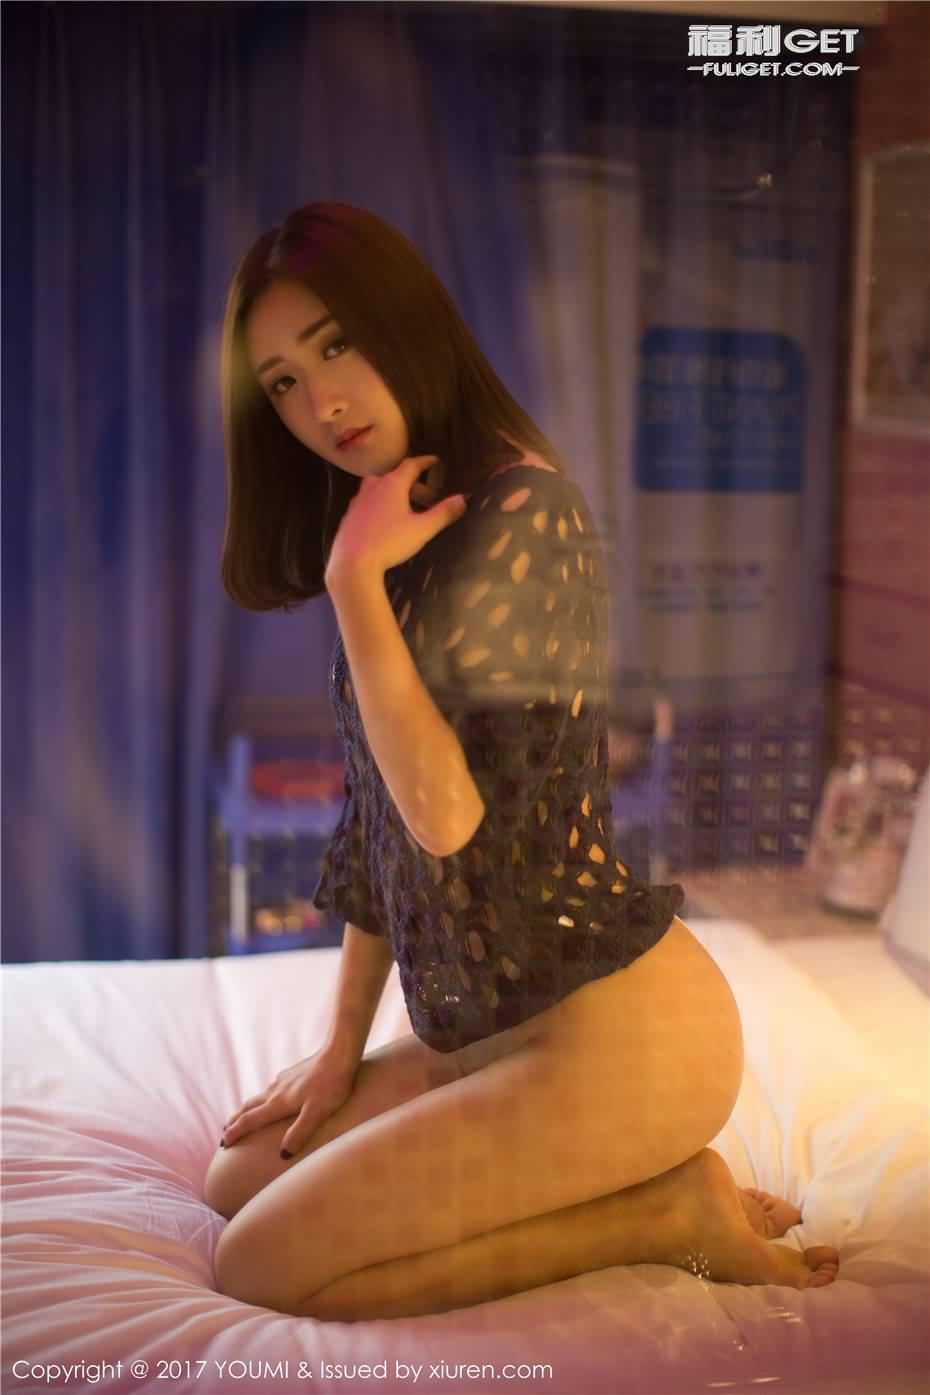 fuliget.com 2017 04 18 14 51 33 272 - [YouMi尤蜜荟]Vol.020 周琰琳LIN 2017-02-28 [55+1P/242M]